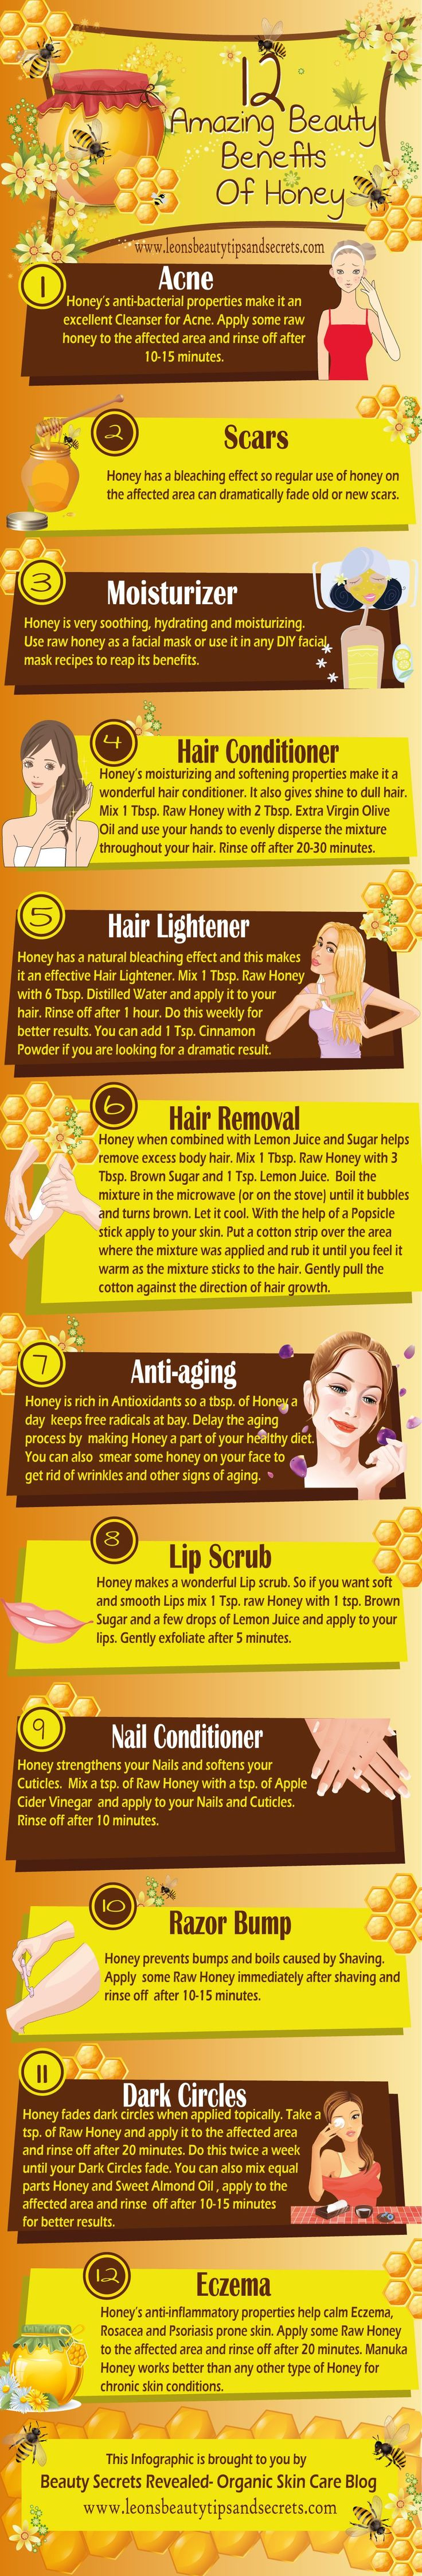 12 Amazing Beauty Benefits Of Honey #Infographic #Honey #Health